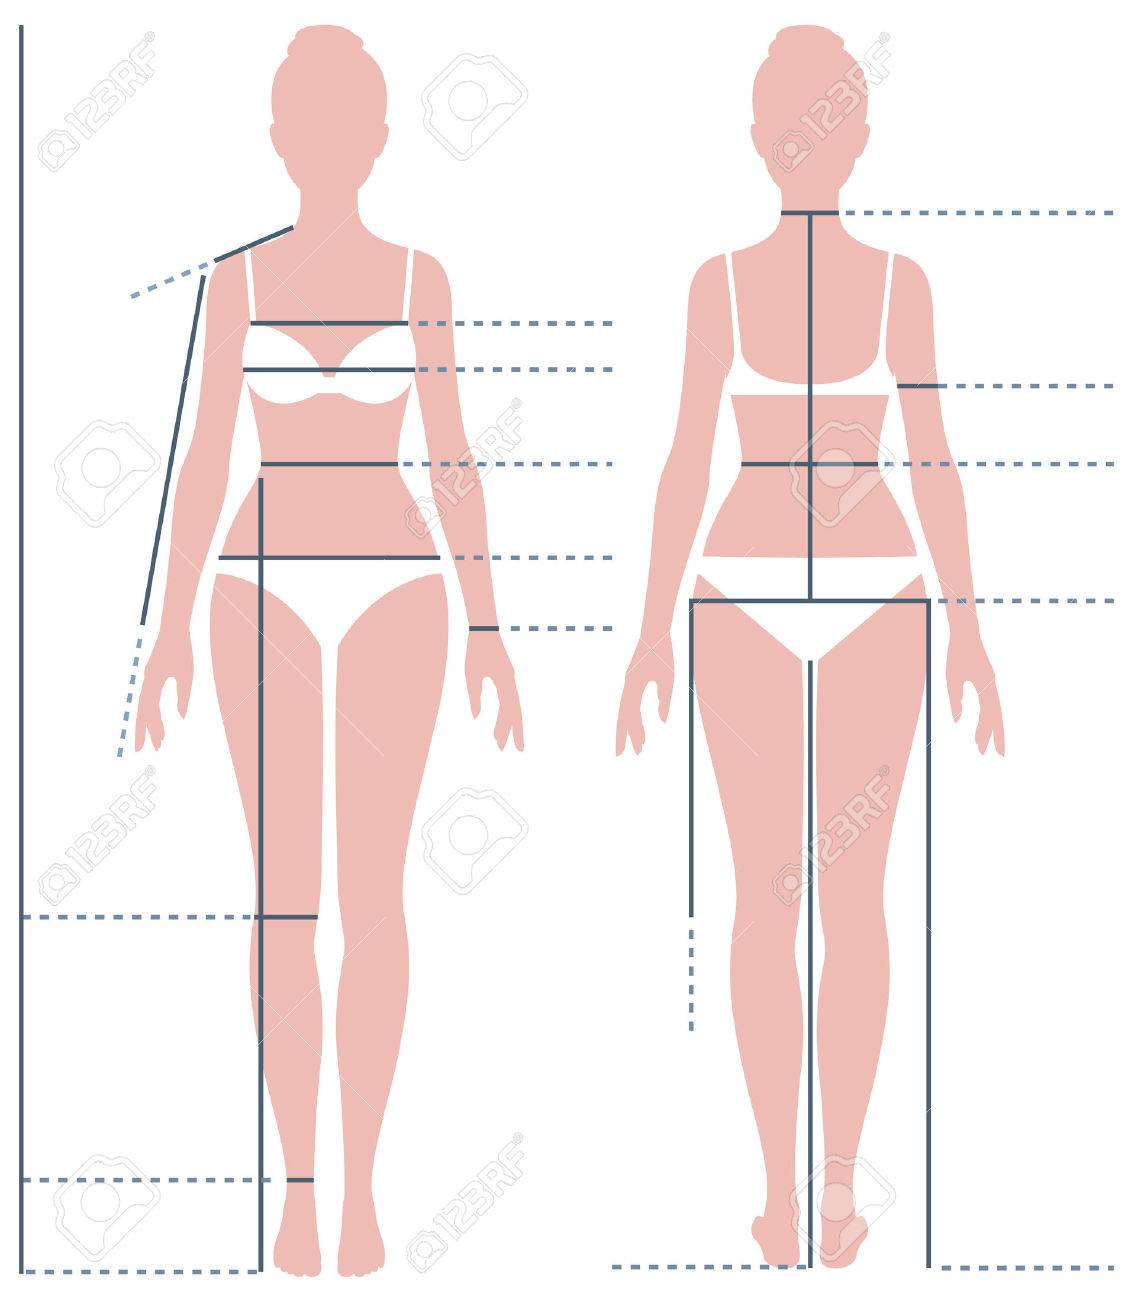 Female body in full length for measuring the size of the figure Stock vector illustration - 64300205